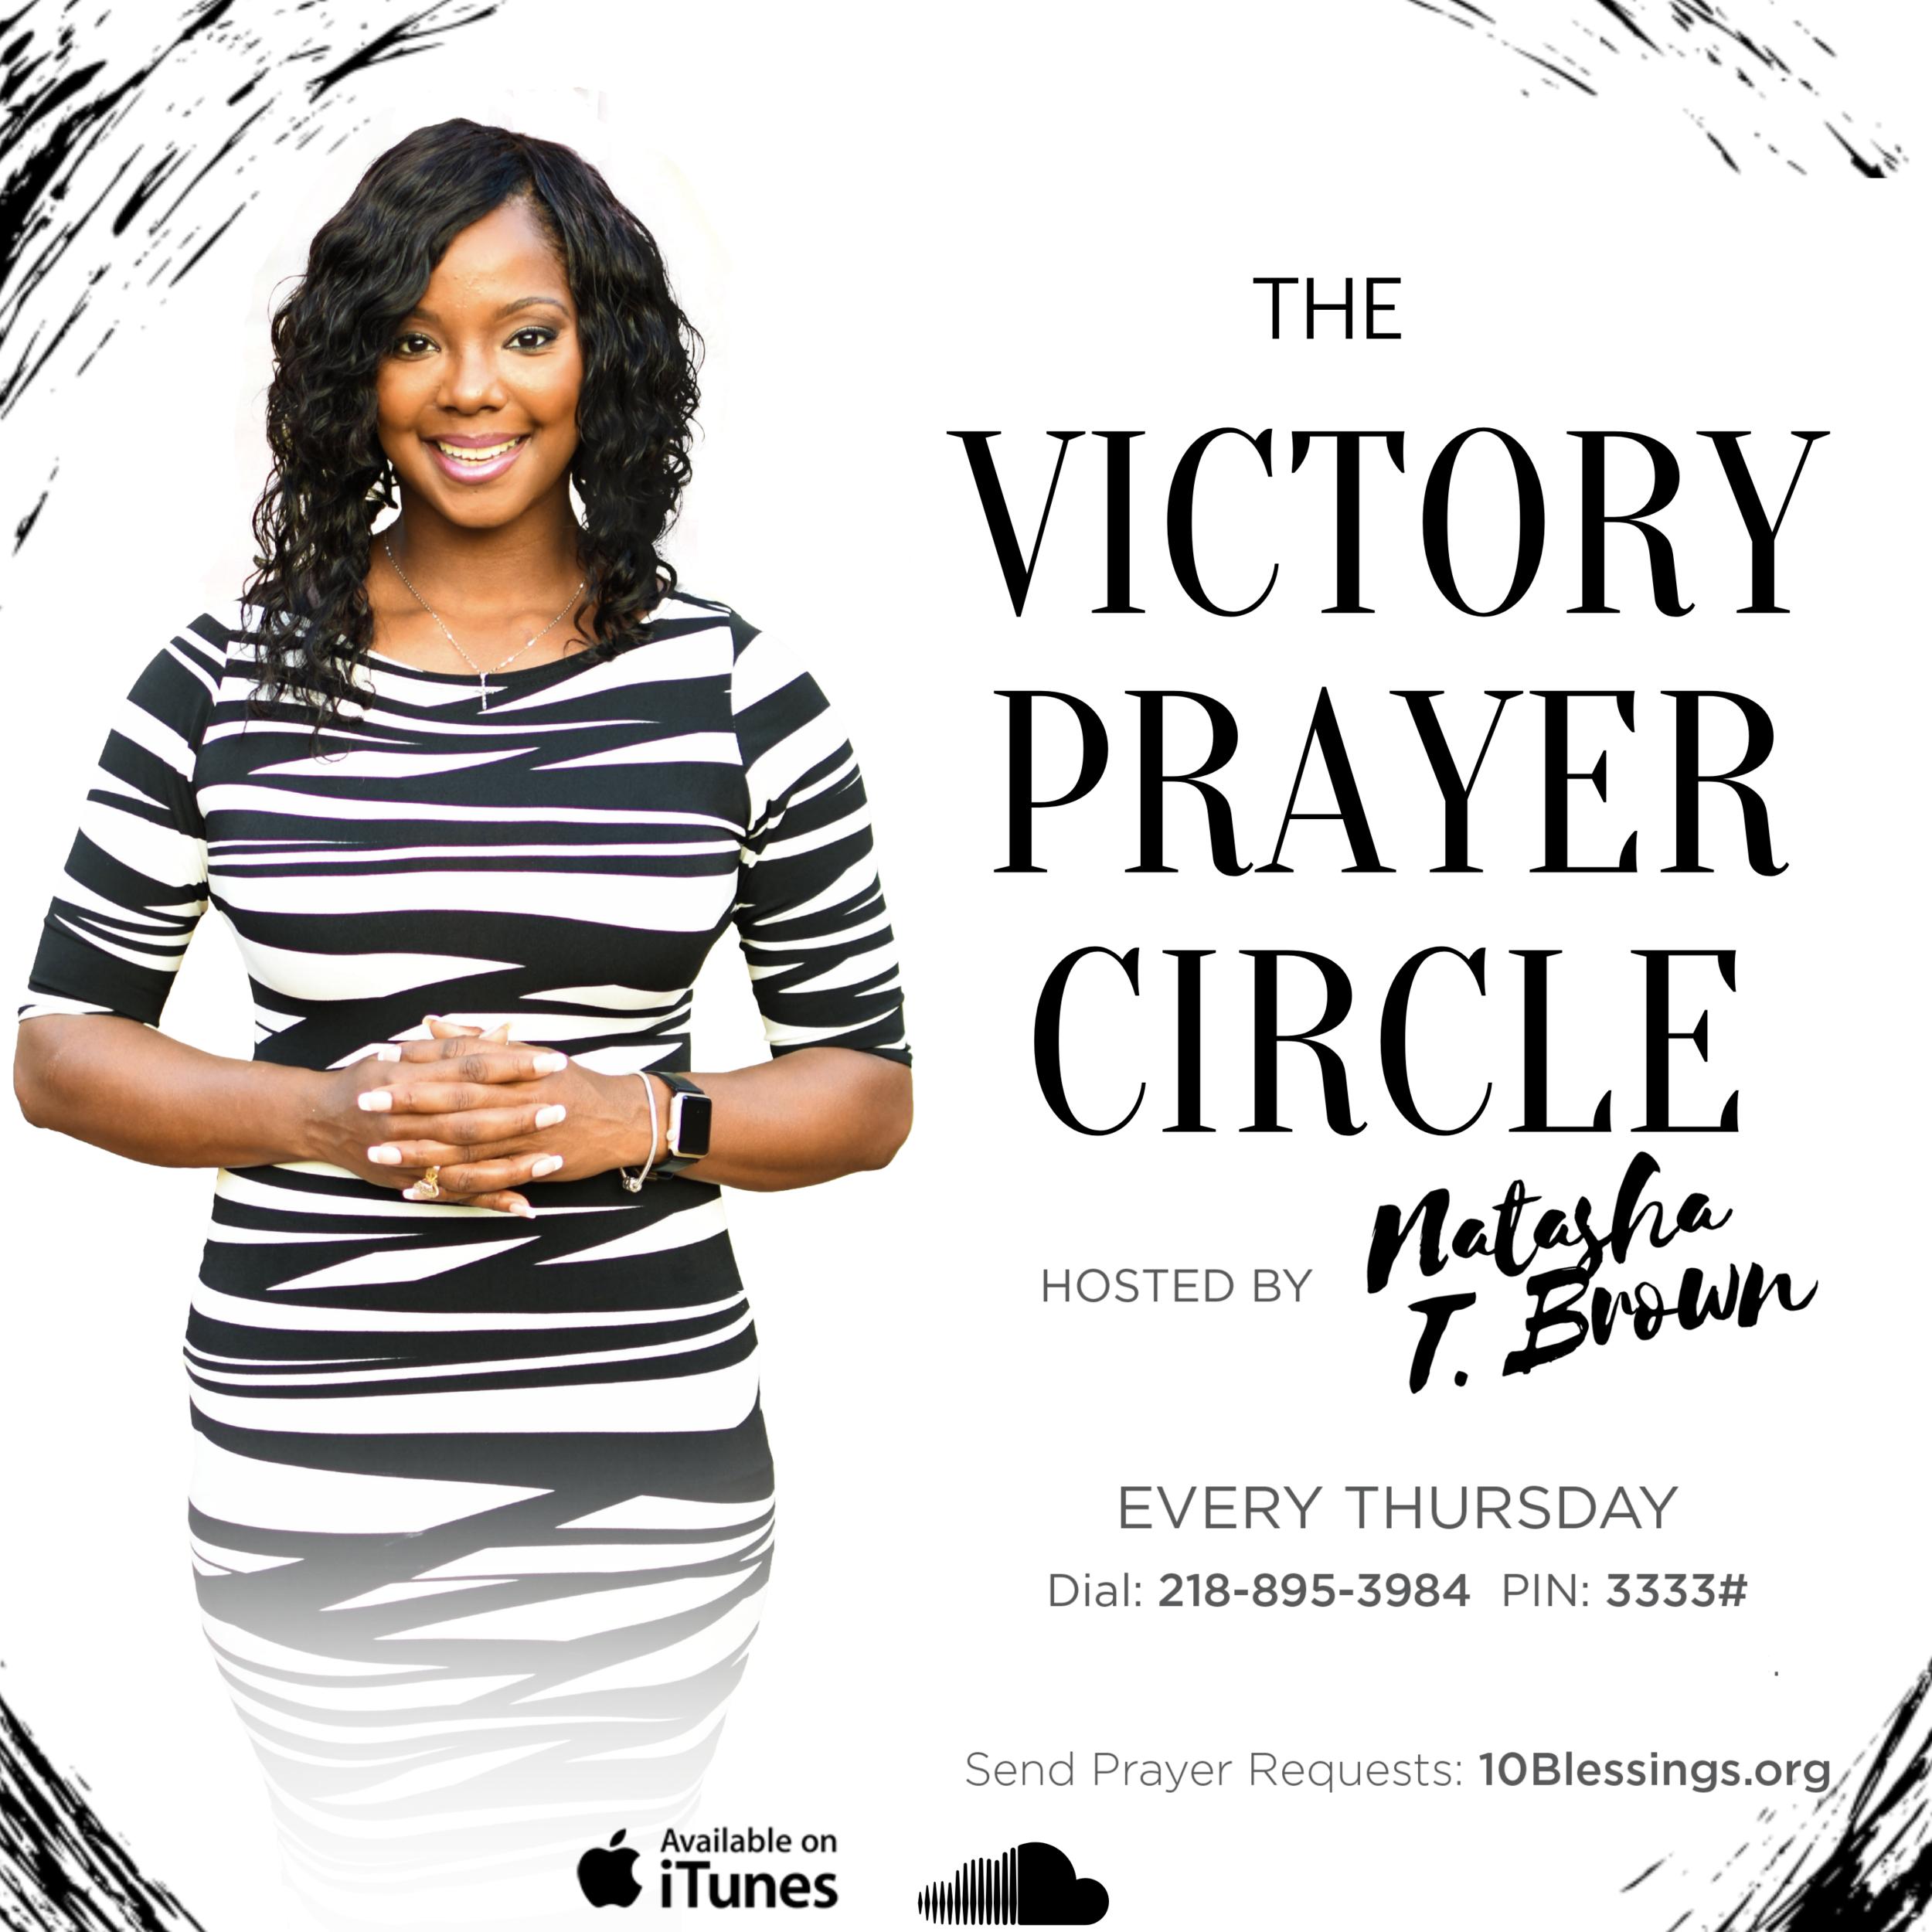 The Victory Prayer Circle